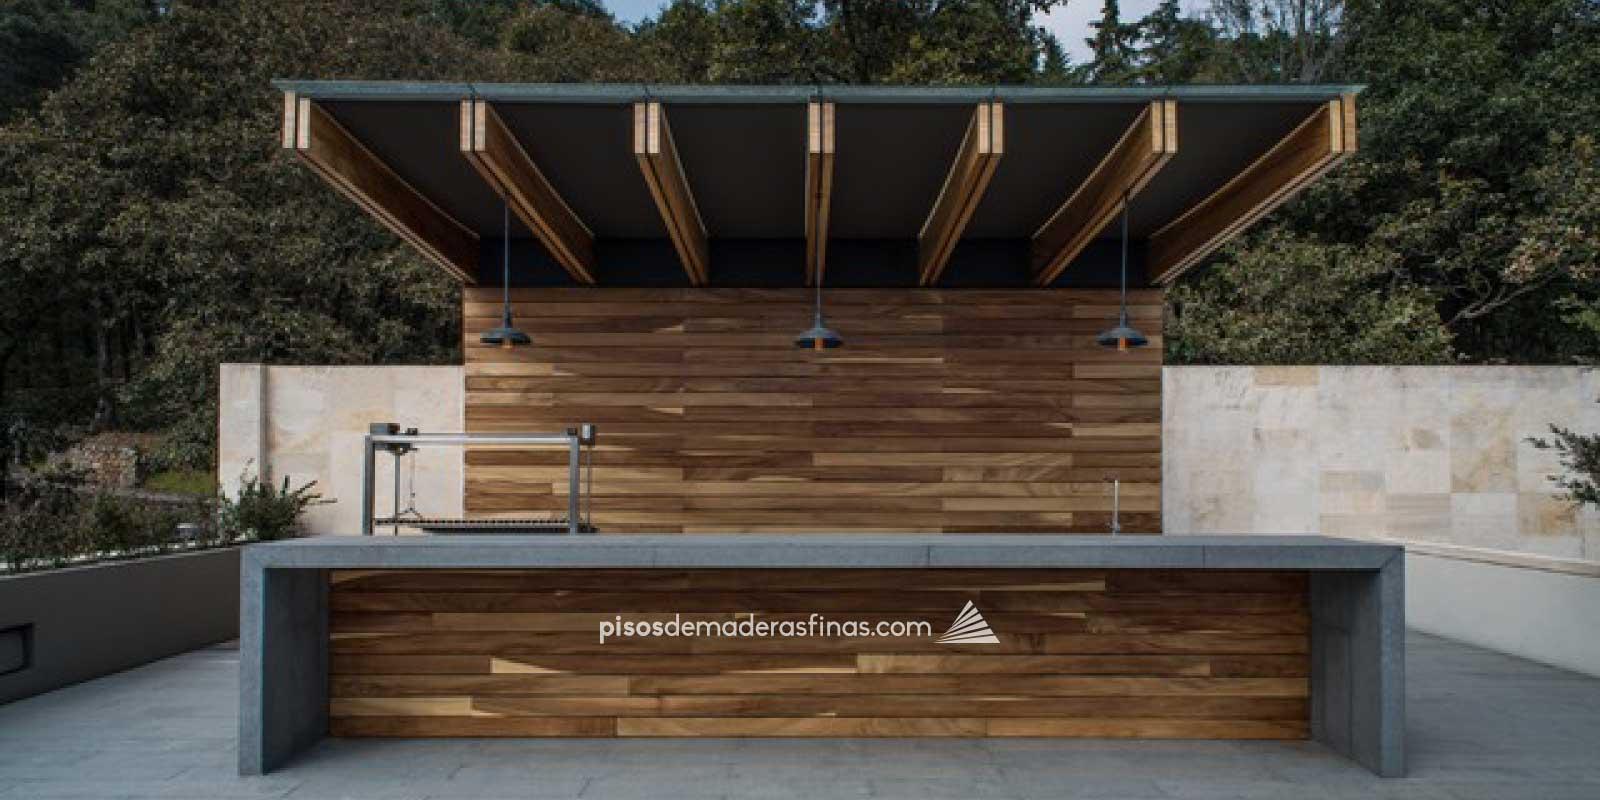 Deck de madera de parota huanacaxtle piso de madera para for Deck para exteriores